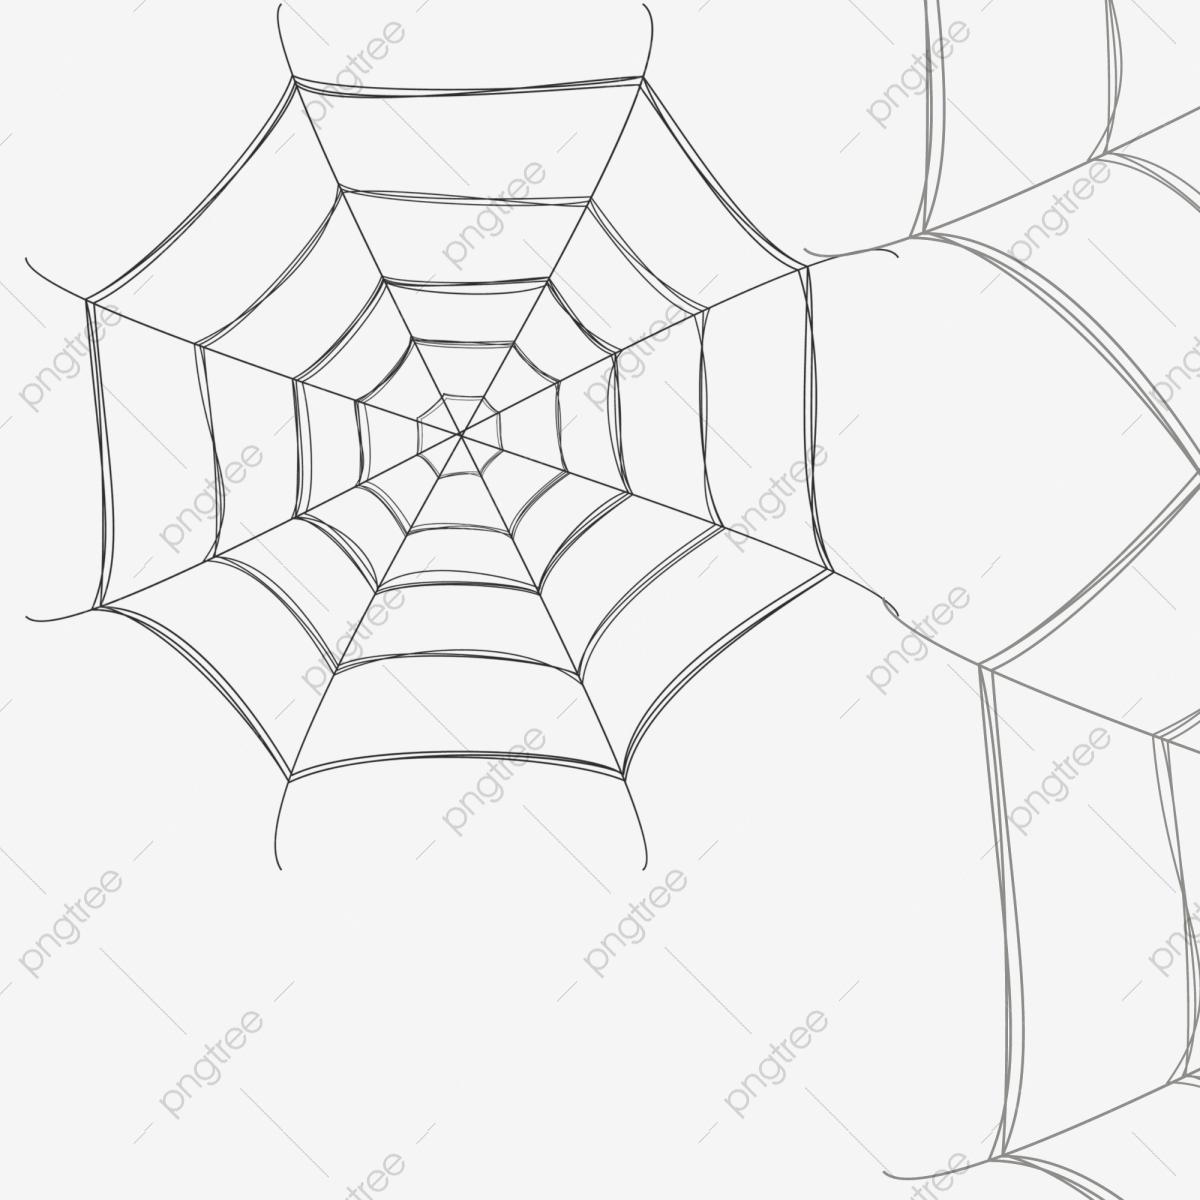 Dessin De Toiles D'araignée , Toile D'araignée De L'icône destiné Toile D Araignée Dessin